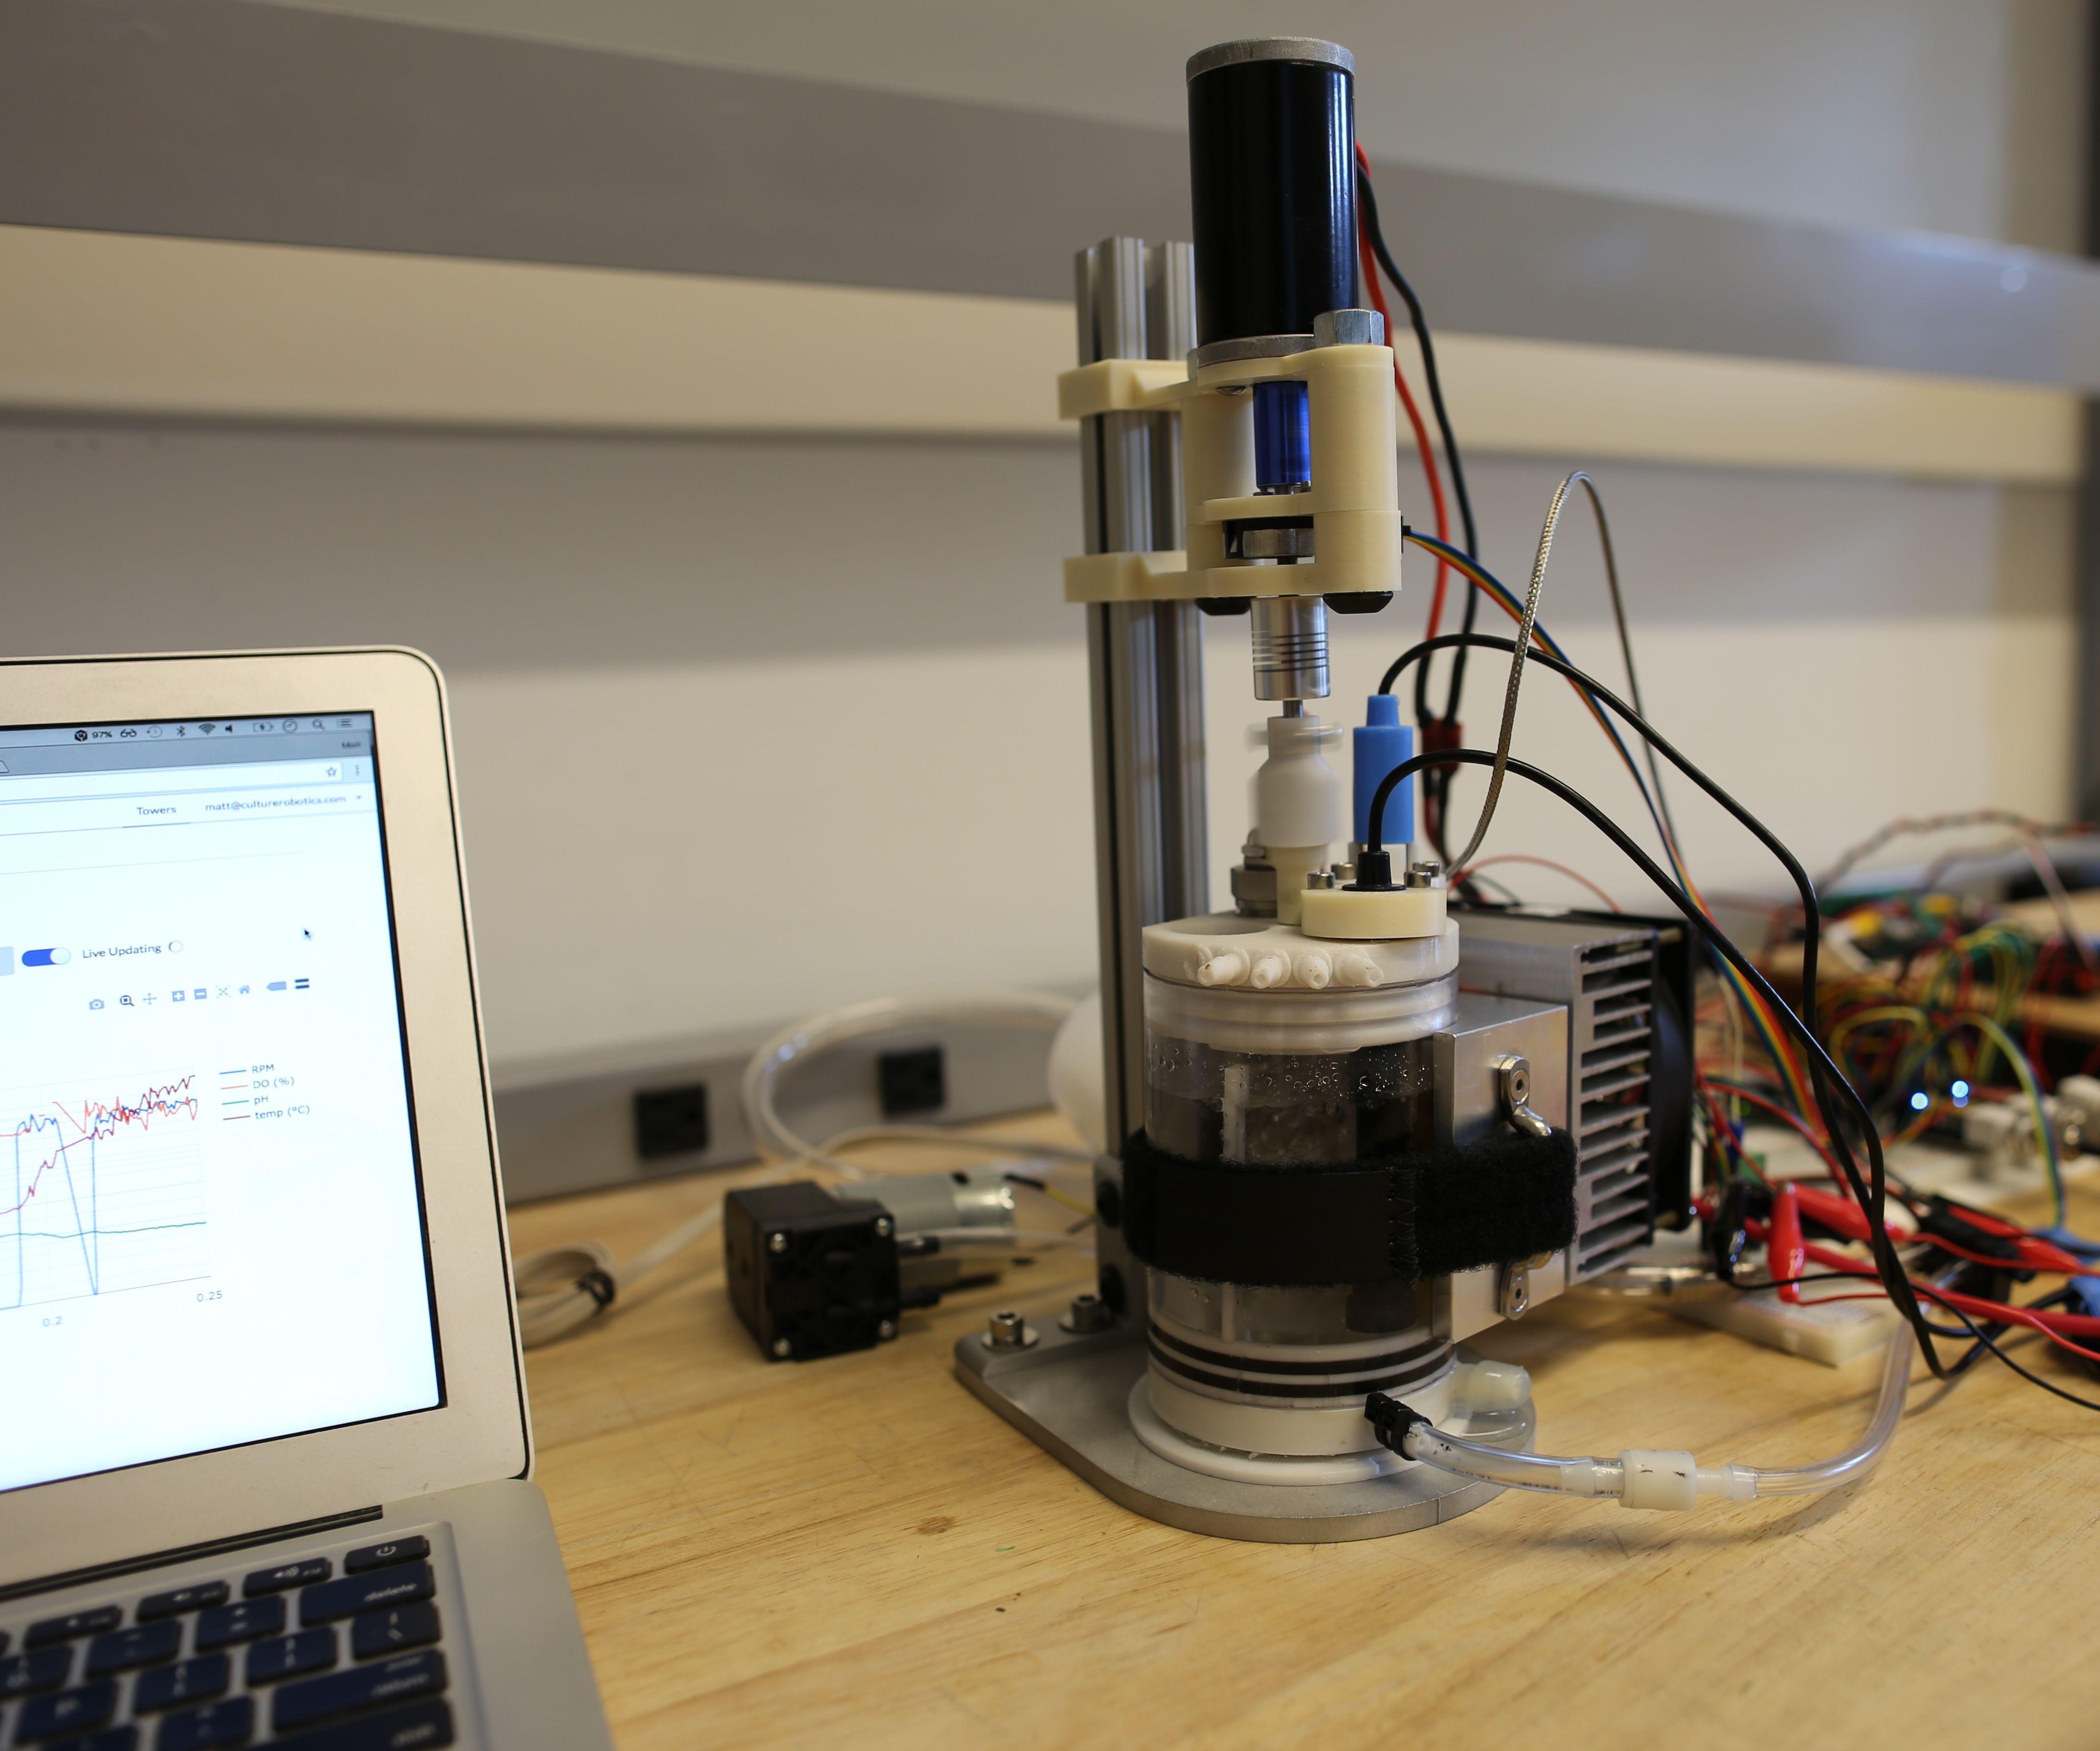 3D printed, web-controlled bioreactor